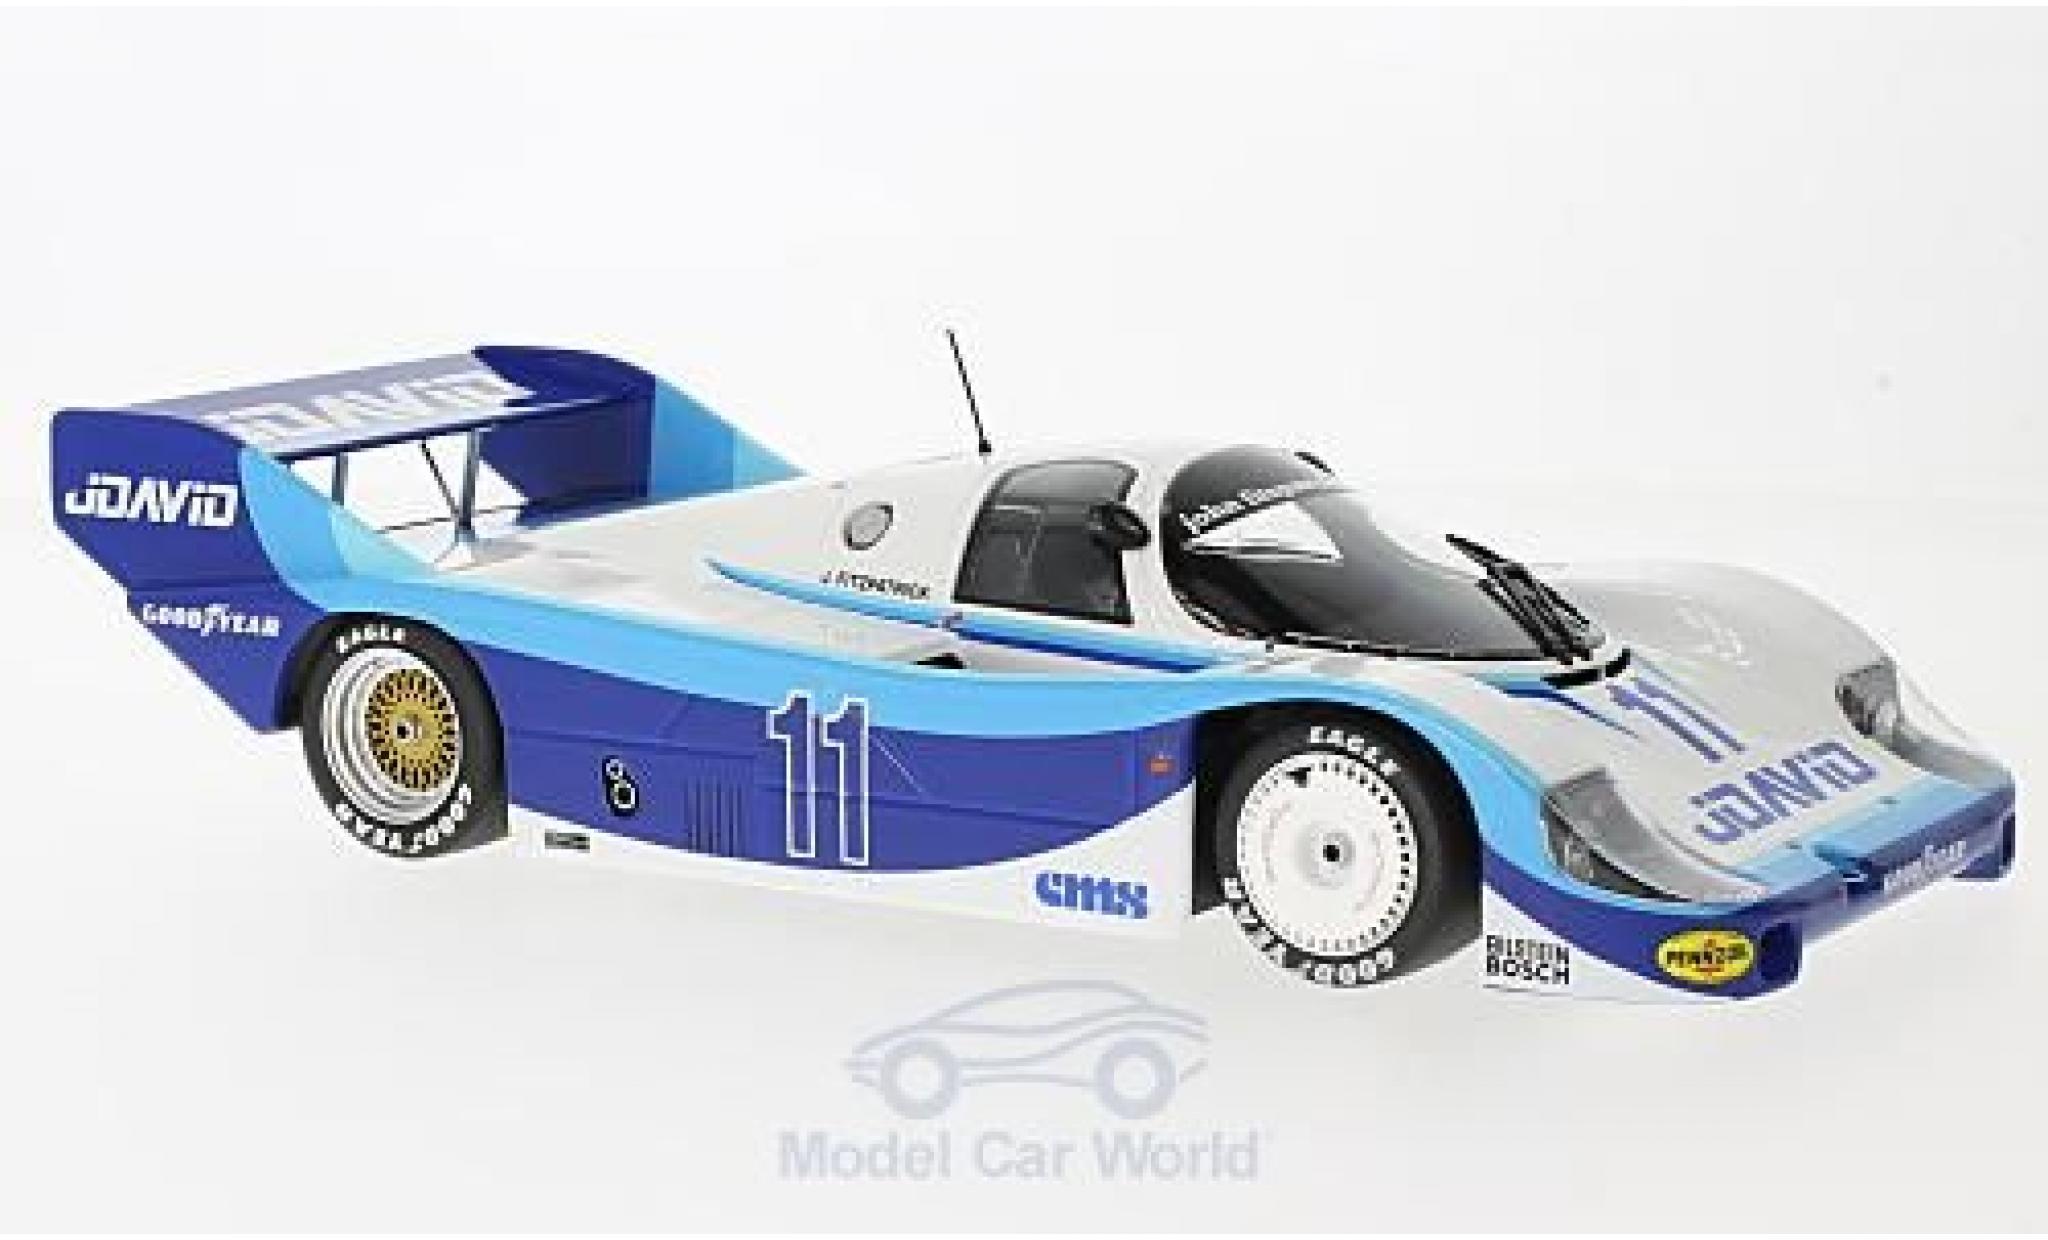 Porsche 956 1983 1/18 Minichamps K No.11 John Fitzpatrick Racing JDavid DRM Bergischer Löwe Zolder 1983 J.Fitzpatrick